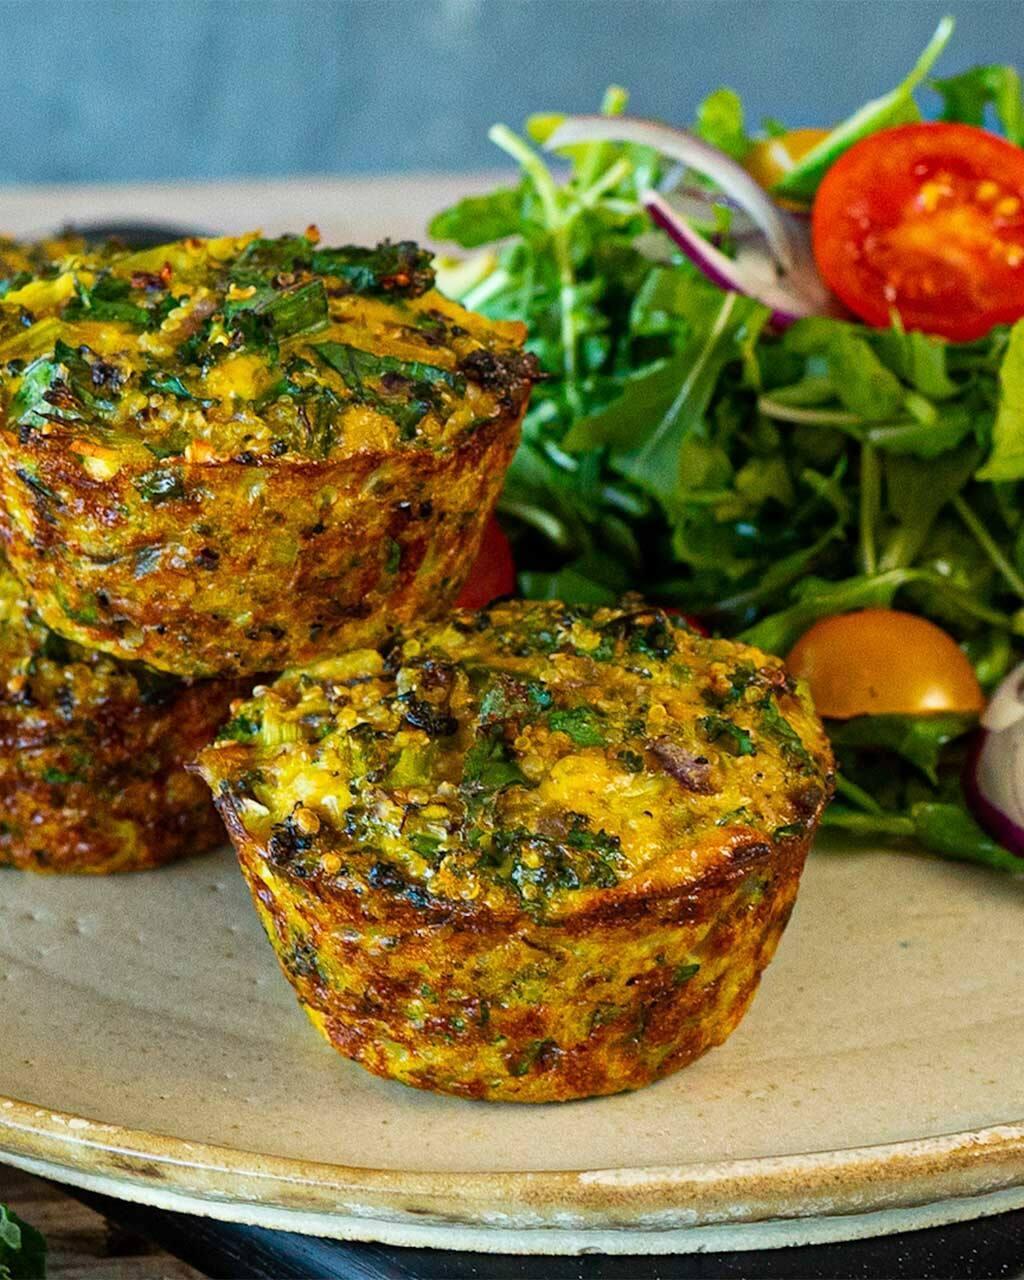 Muffins frittata de quinoa y brócoli con un toque de Savora